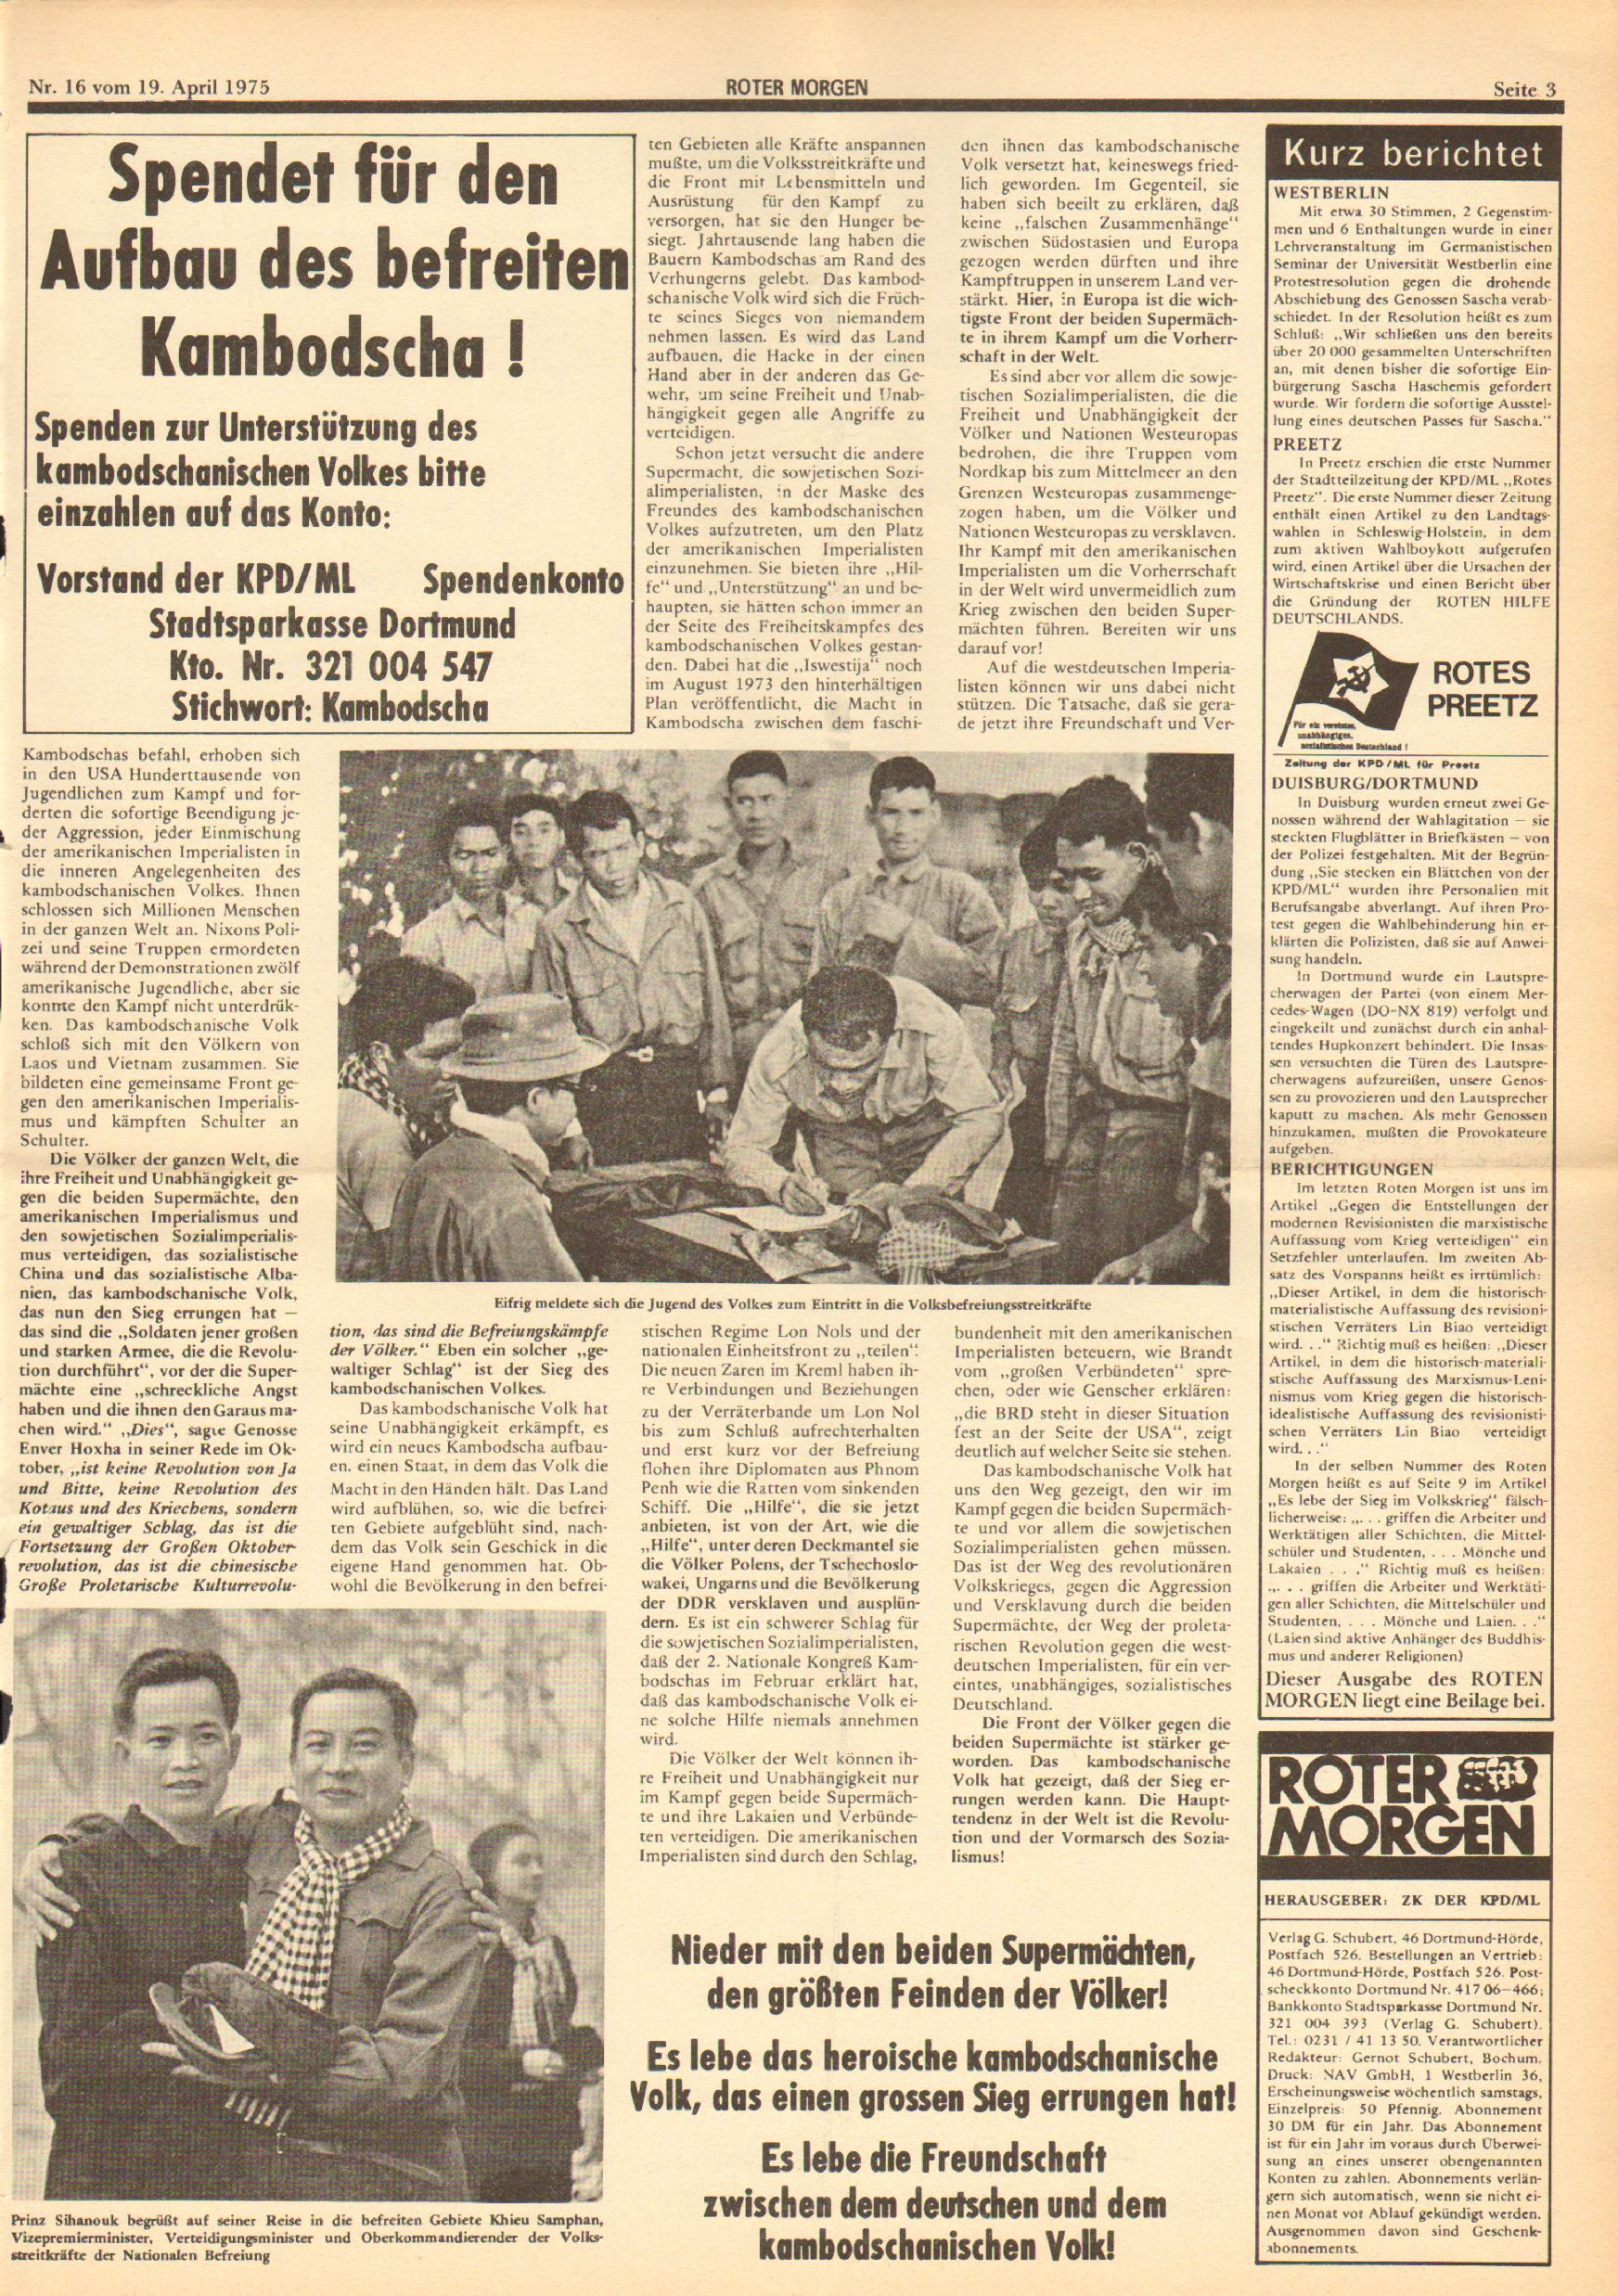 Roter Morgen, 9. Jg., 19. April 1975, Nr. 16, Seite 3